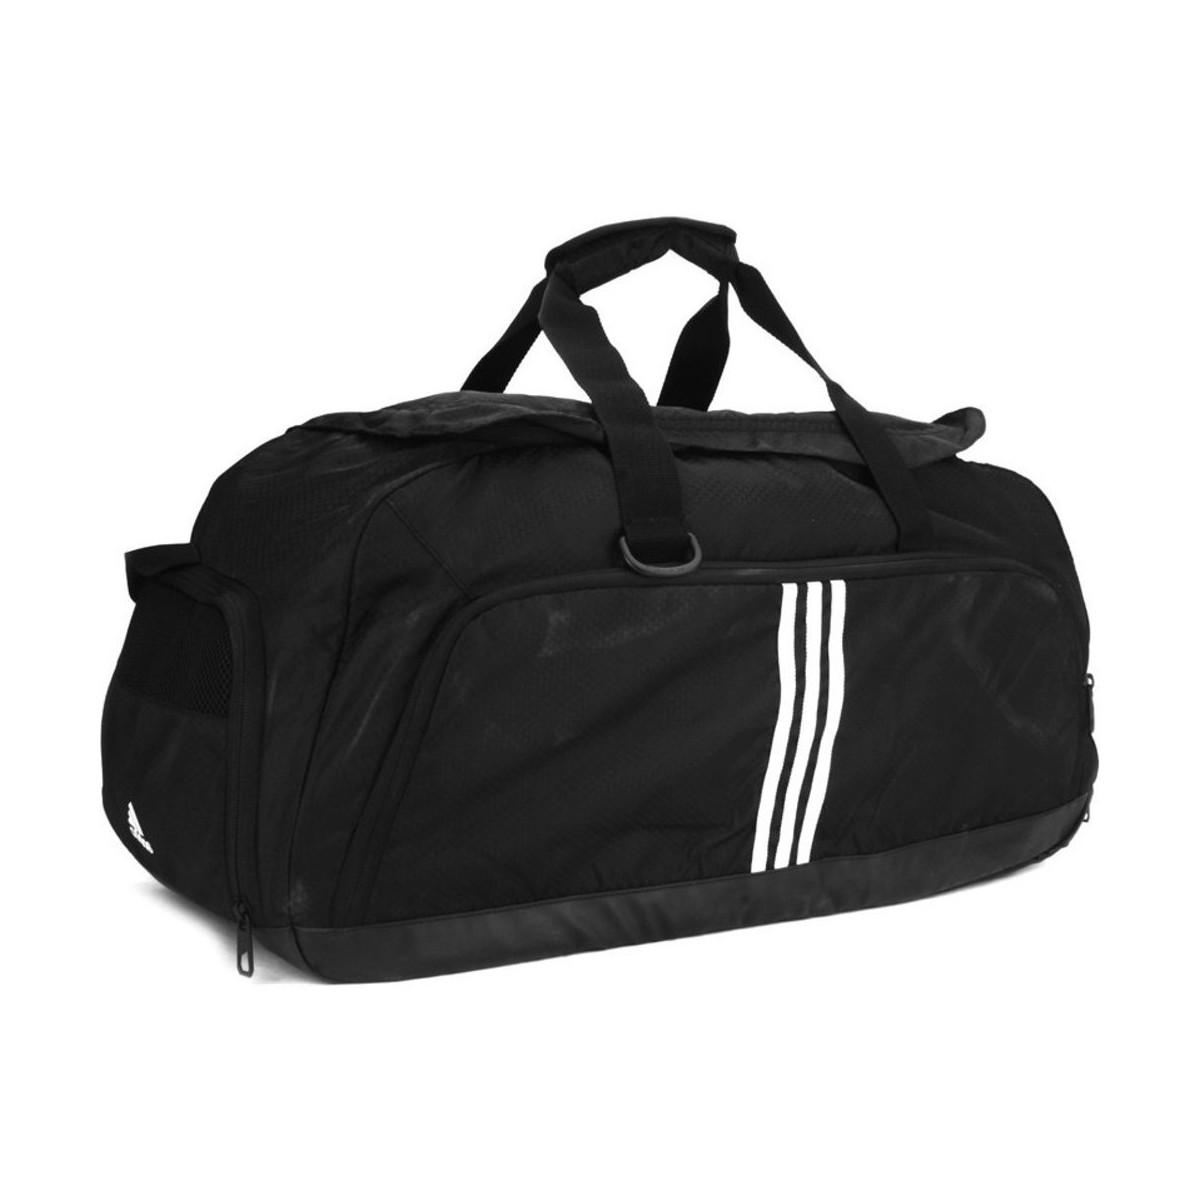 adidas 3 Stripes Performance Team Bag Medium Men s Bag In Black in ... a5ddba27a8d2a